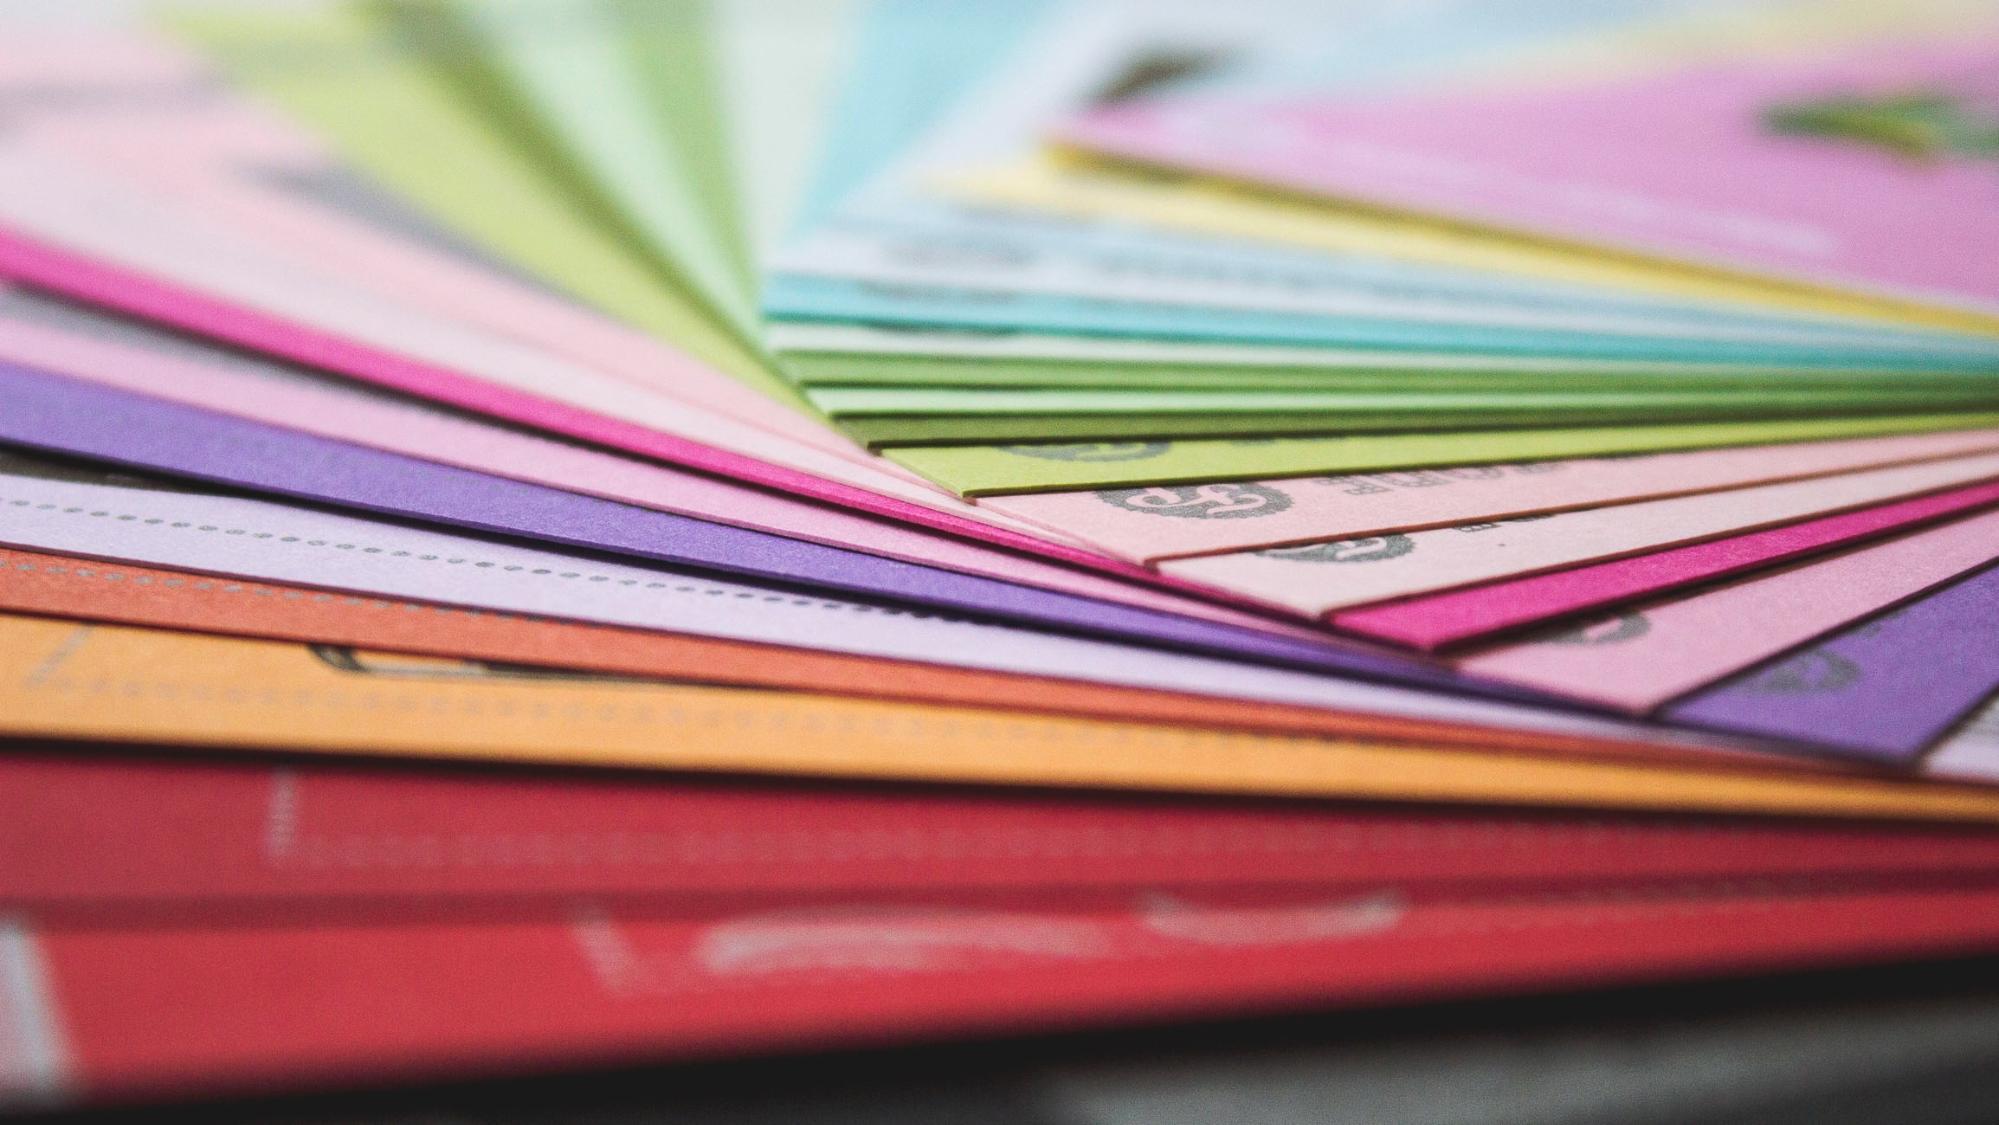 Vibrant color samples